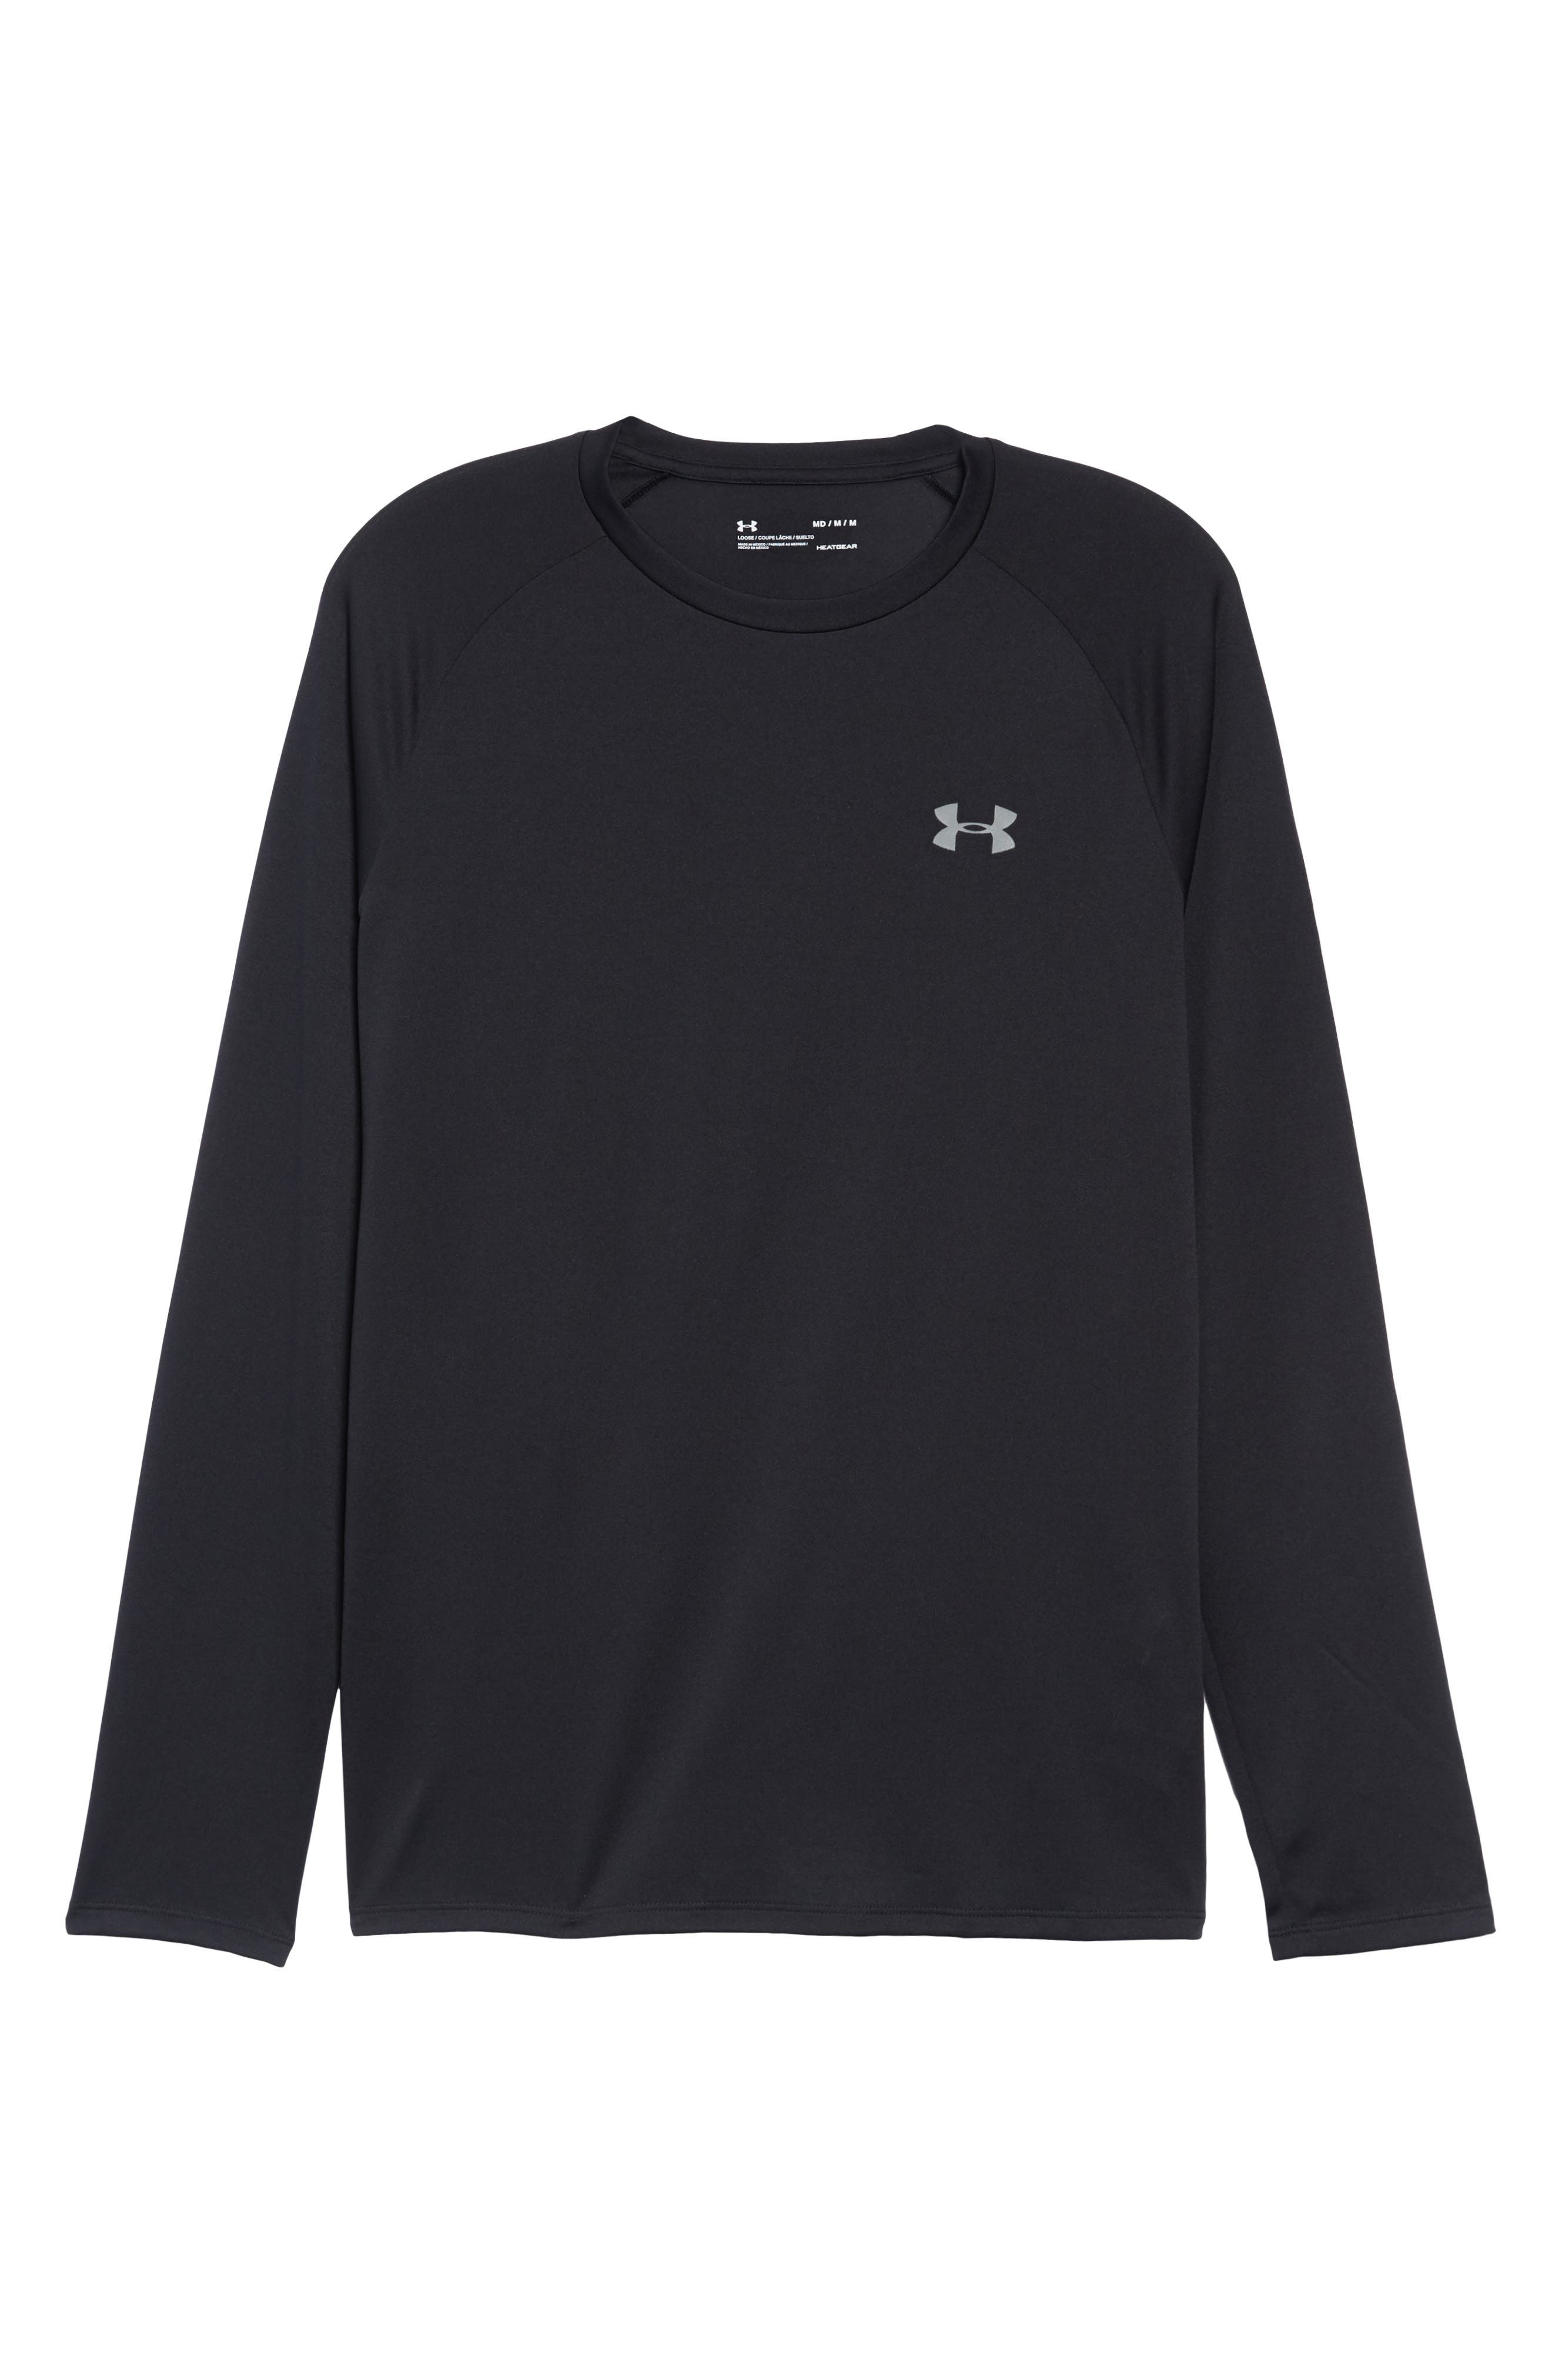 Performance Tech Long Sleeve Shirt,                             Alternate thumbnail 6, color,                             BLACK/ STEEL